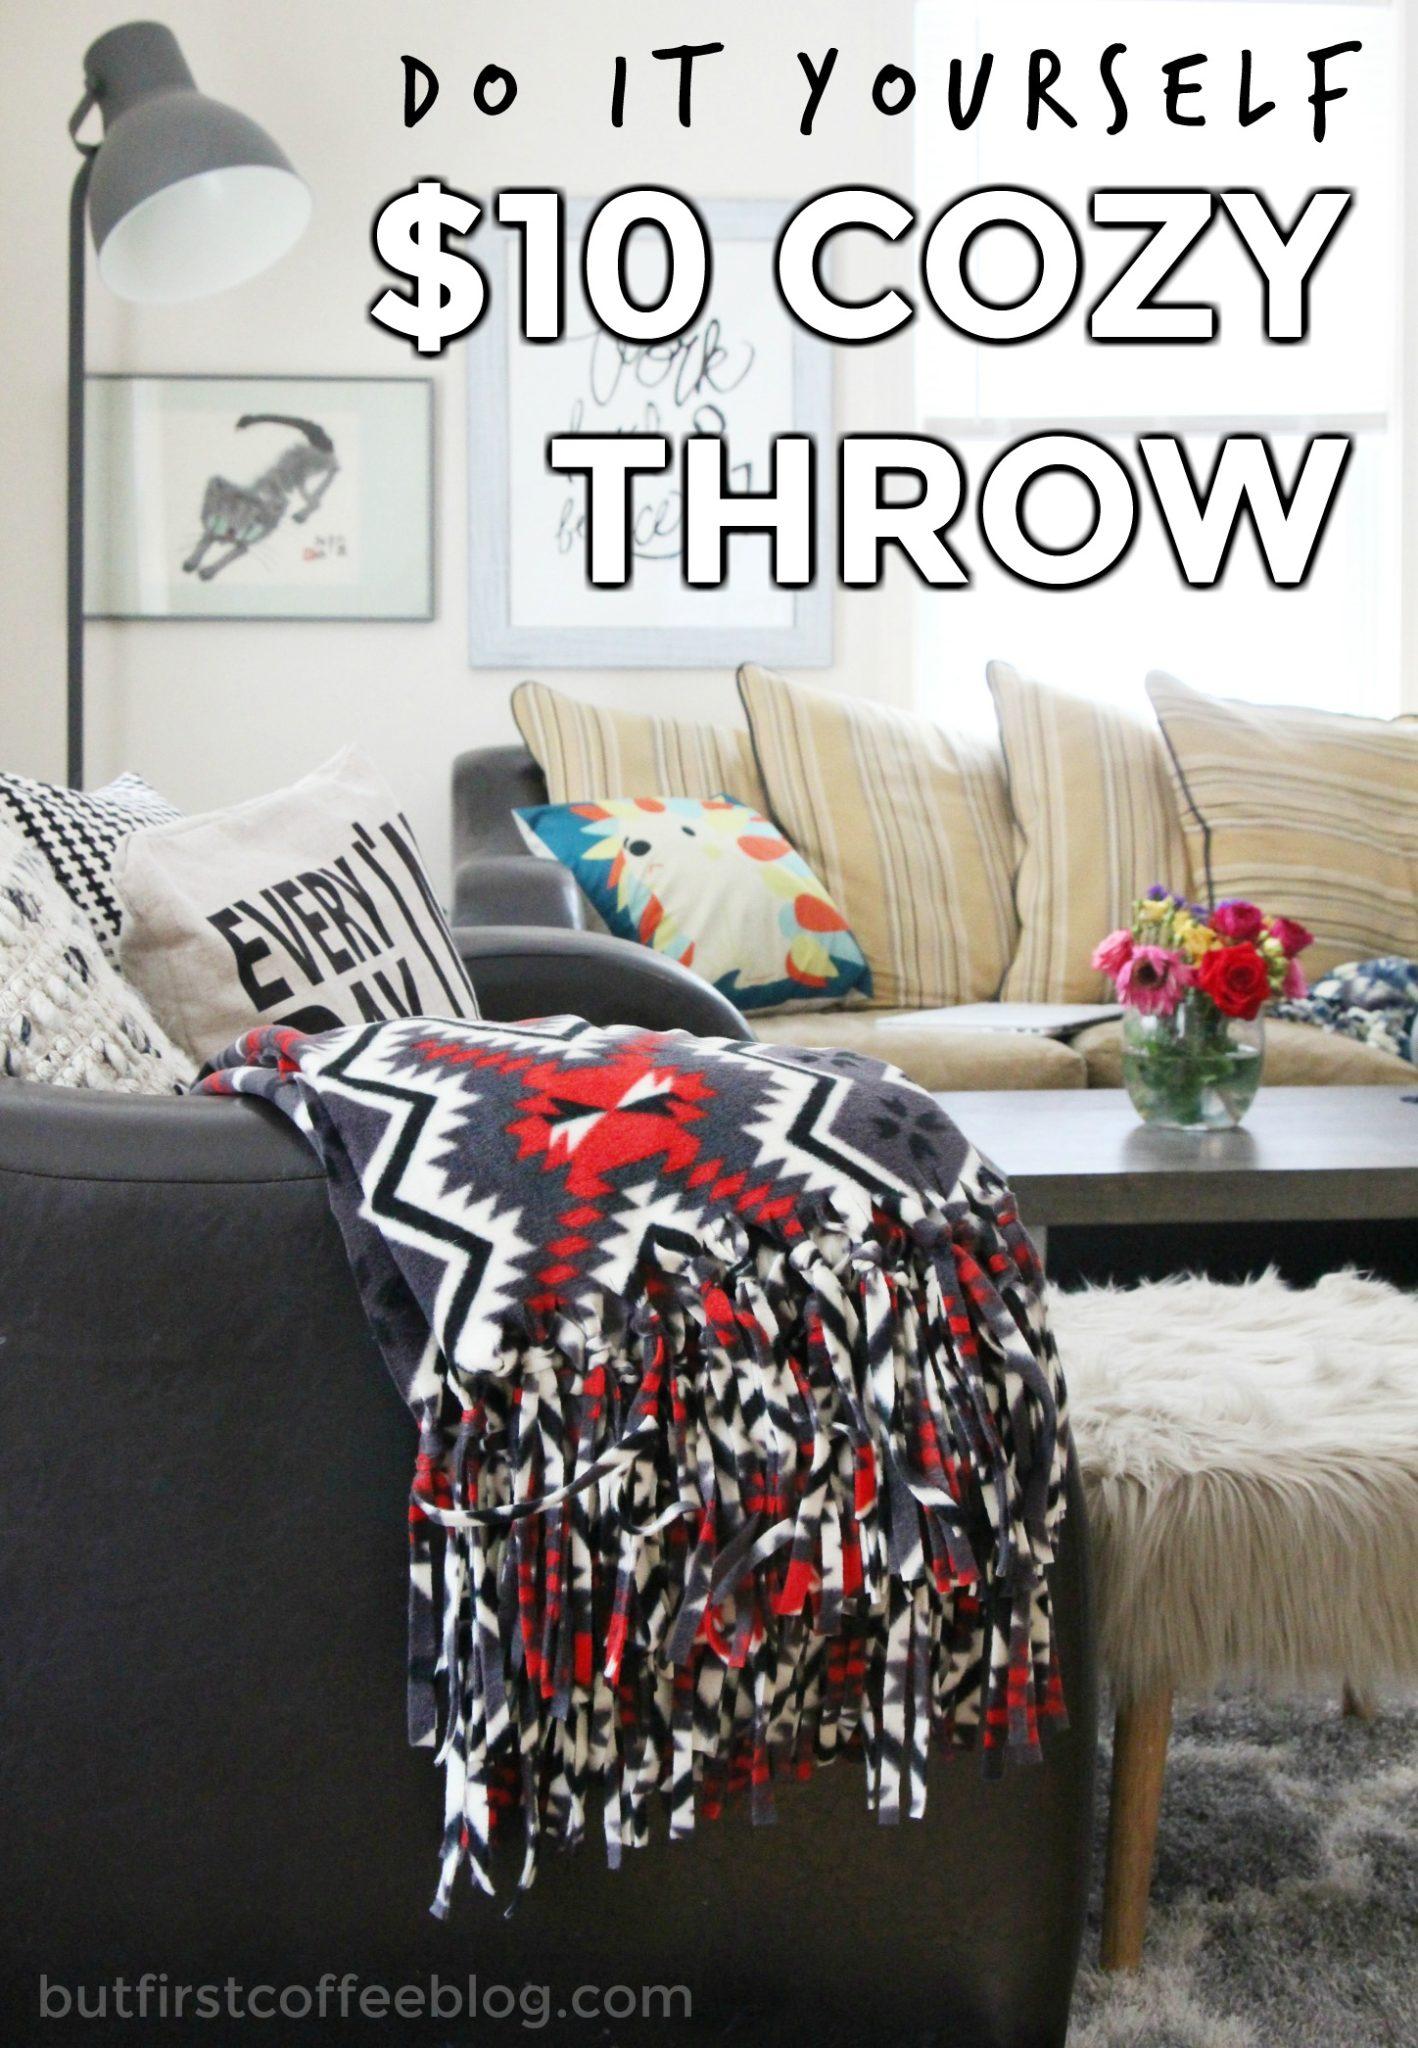 How to Make a Cozy, No Sew Fleece Throw Blanket Tutorial